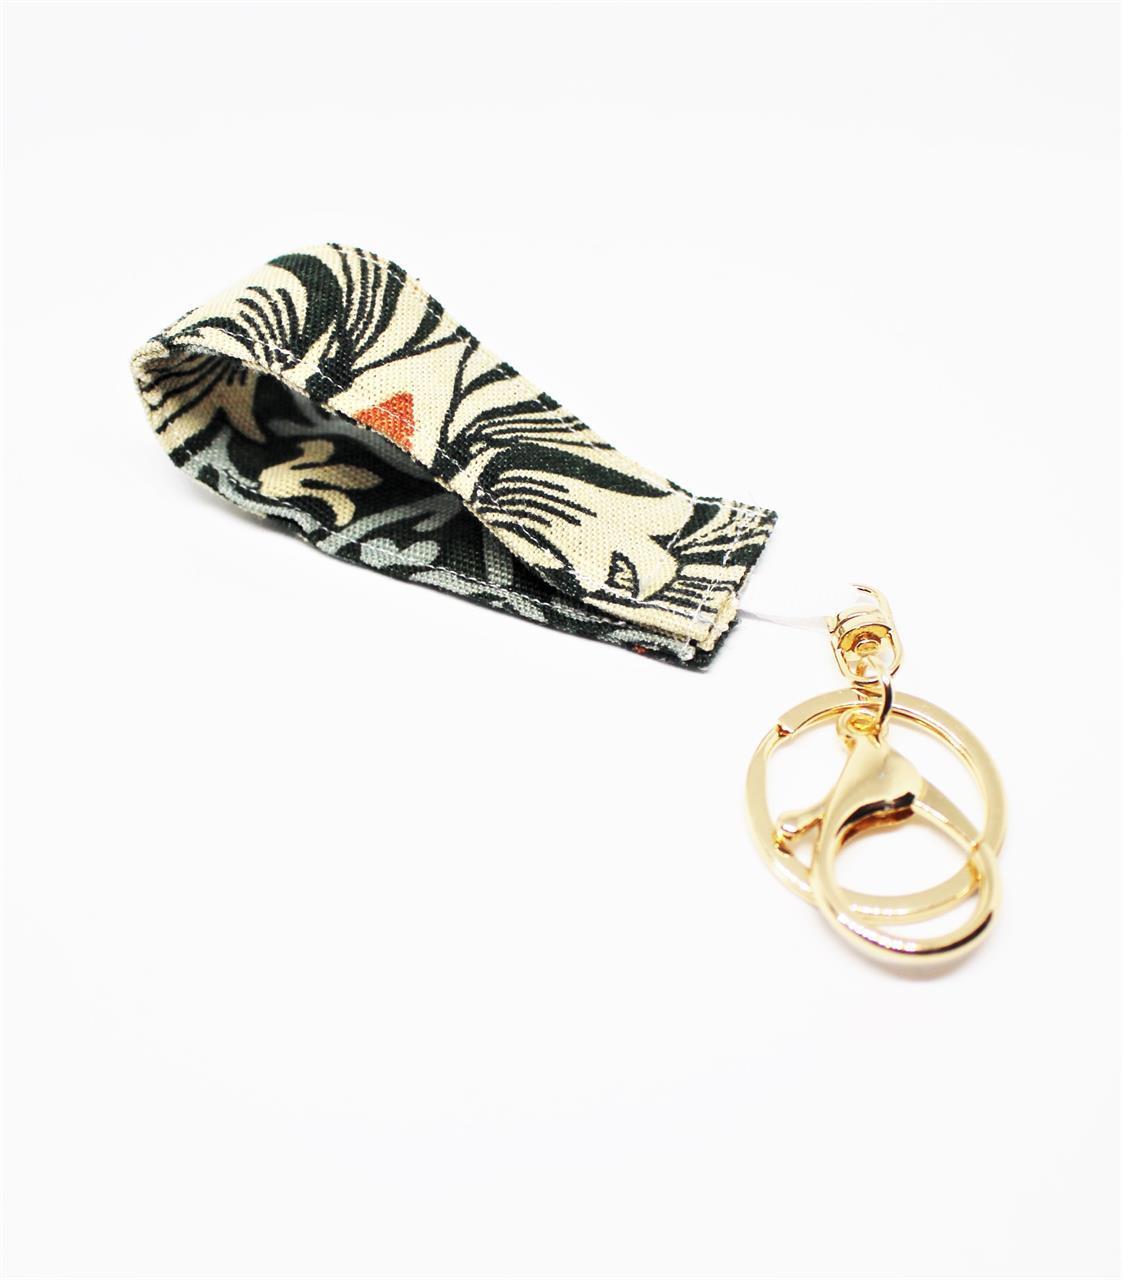 Nyckelring grön snakehead  William Morris